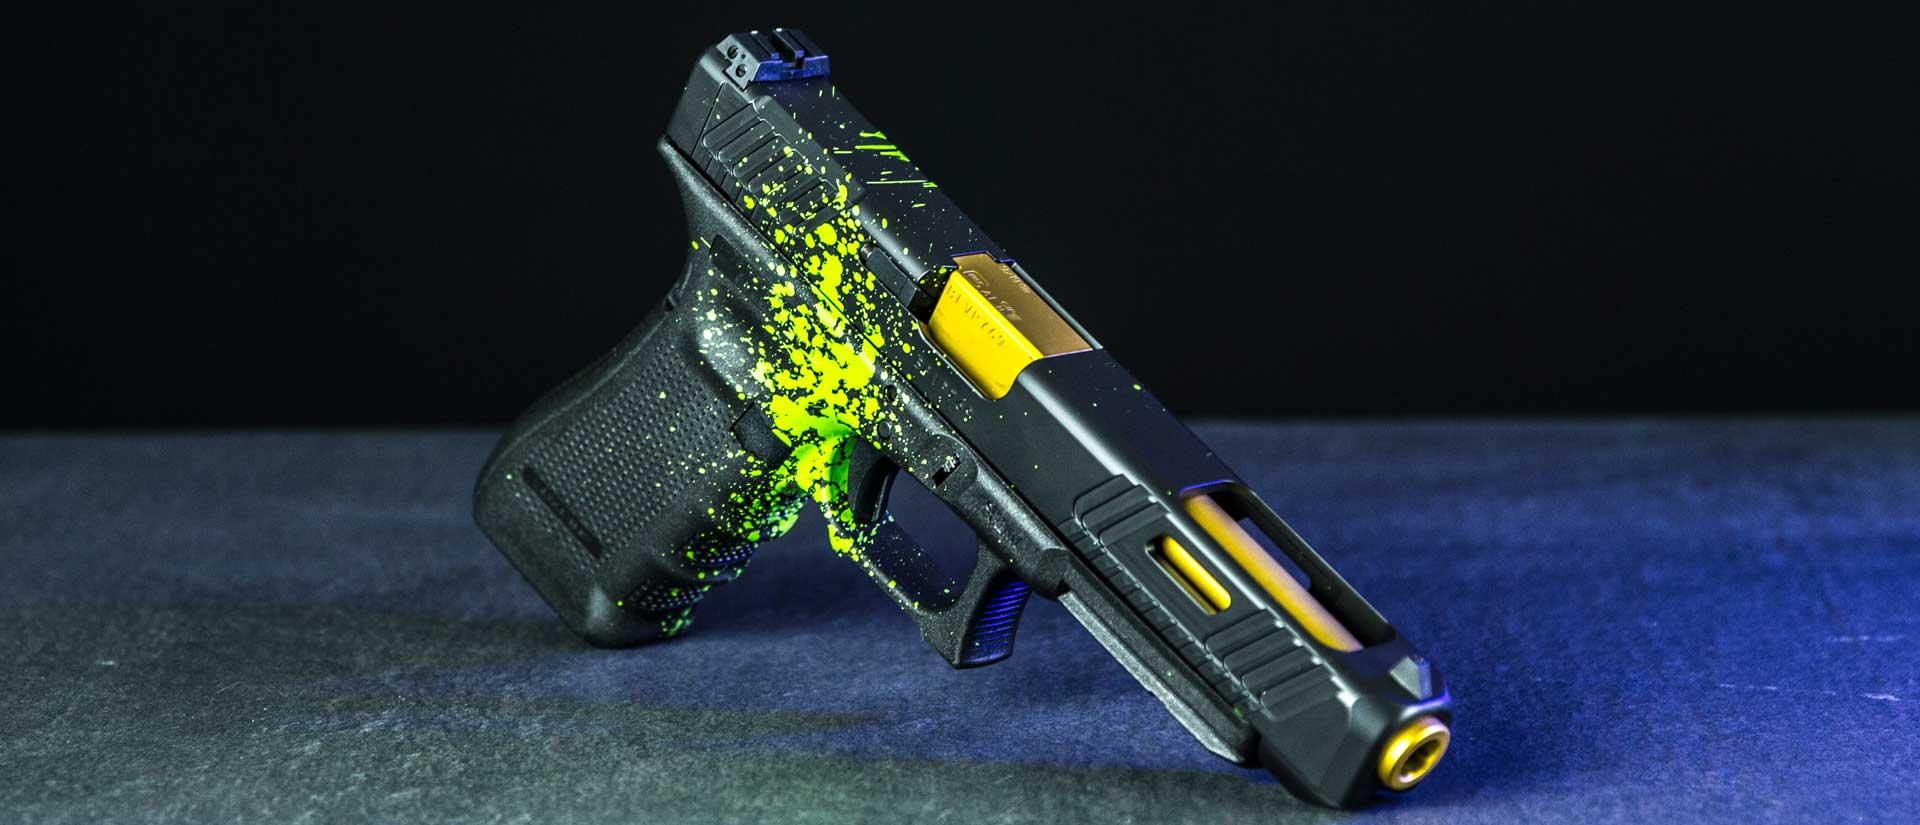 verex-tactical-tuning-waffen-pistole-glock-sig-sauer-17-cz-walther-visier-bruenieren-ar15-red-dot-beschichtung-tuning-cerakote-stippling-griptech-salzburg-slider-06